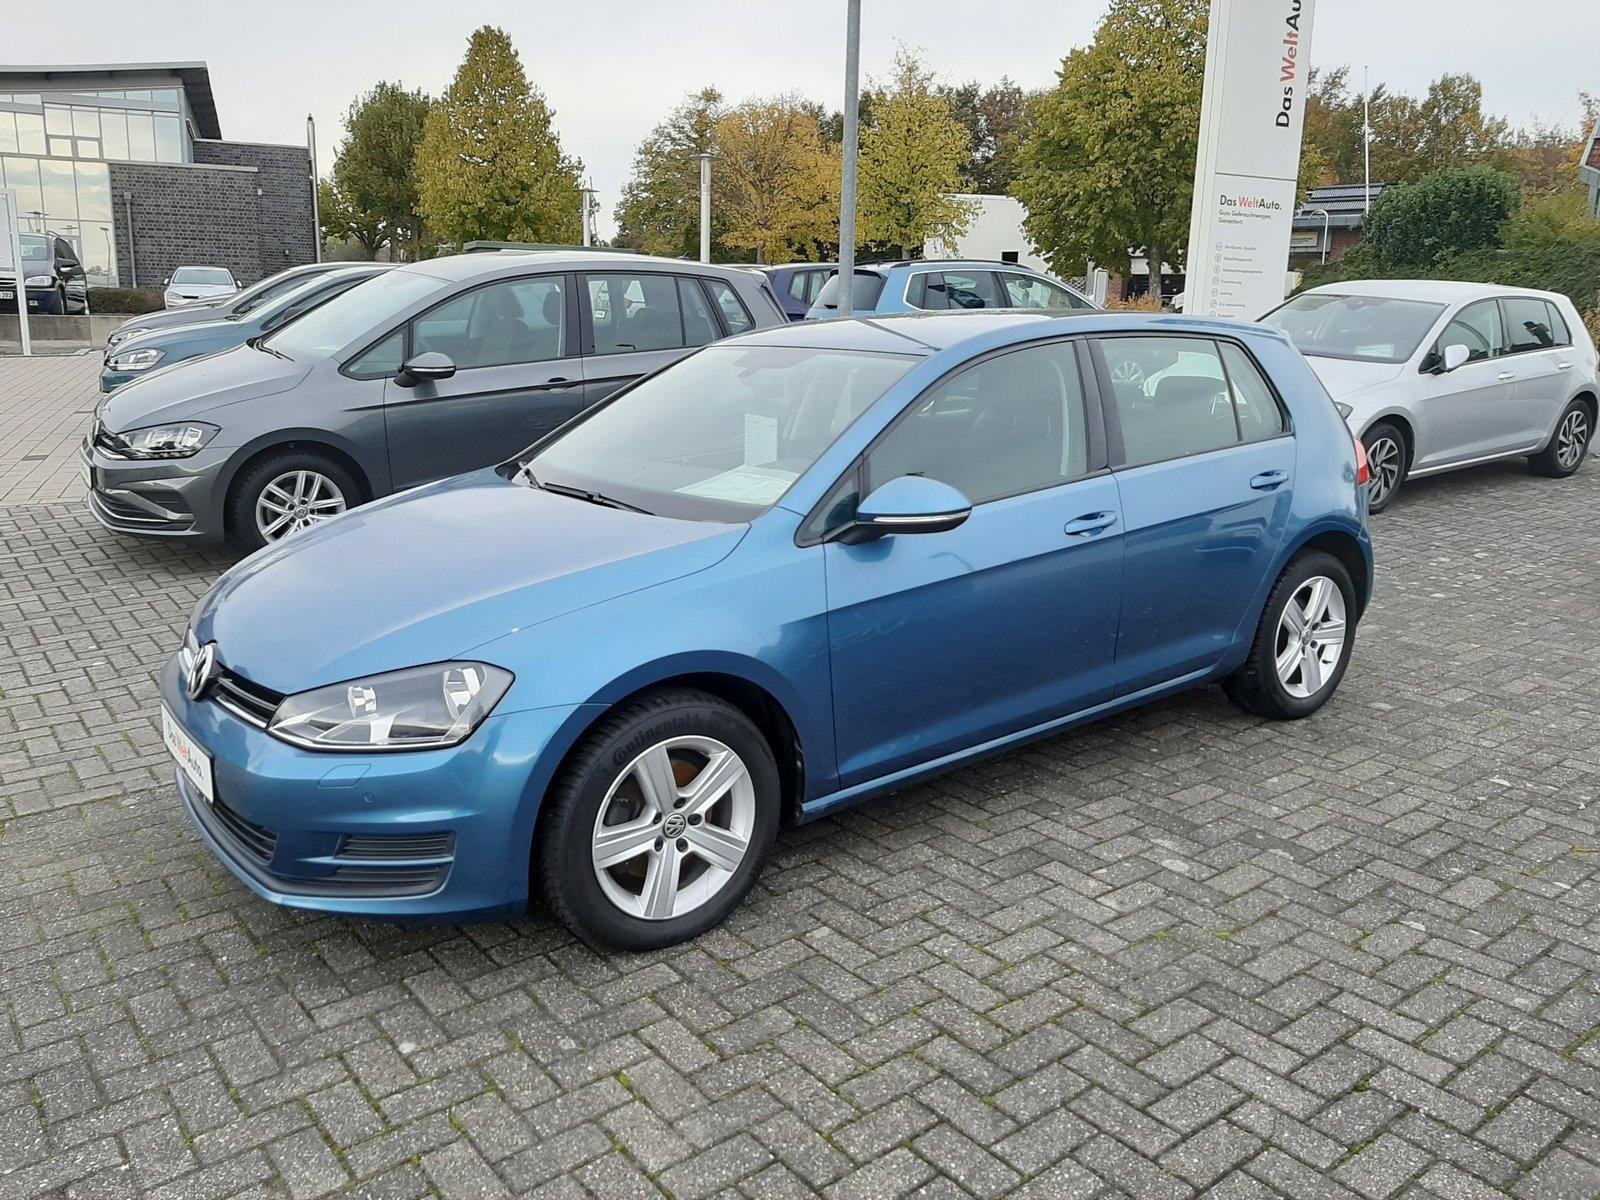 Volkswagen Golf VII 1.2 TSI BMT Comfortline, Jahr 2013, Benzin